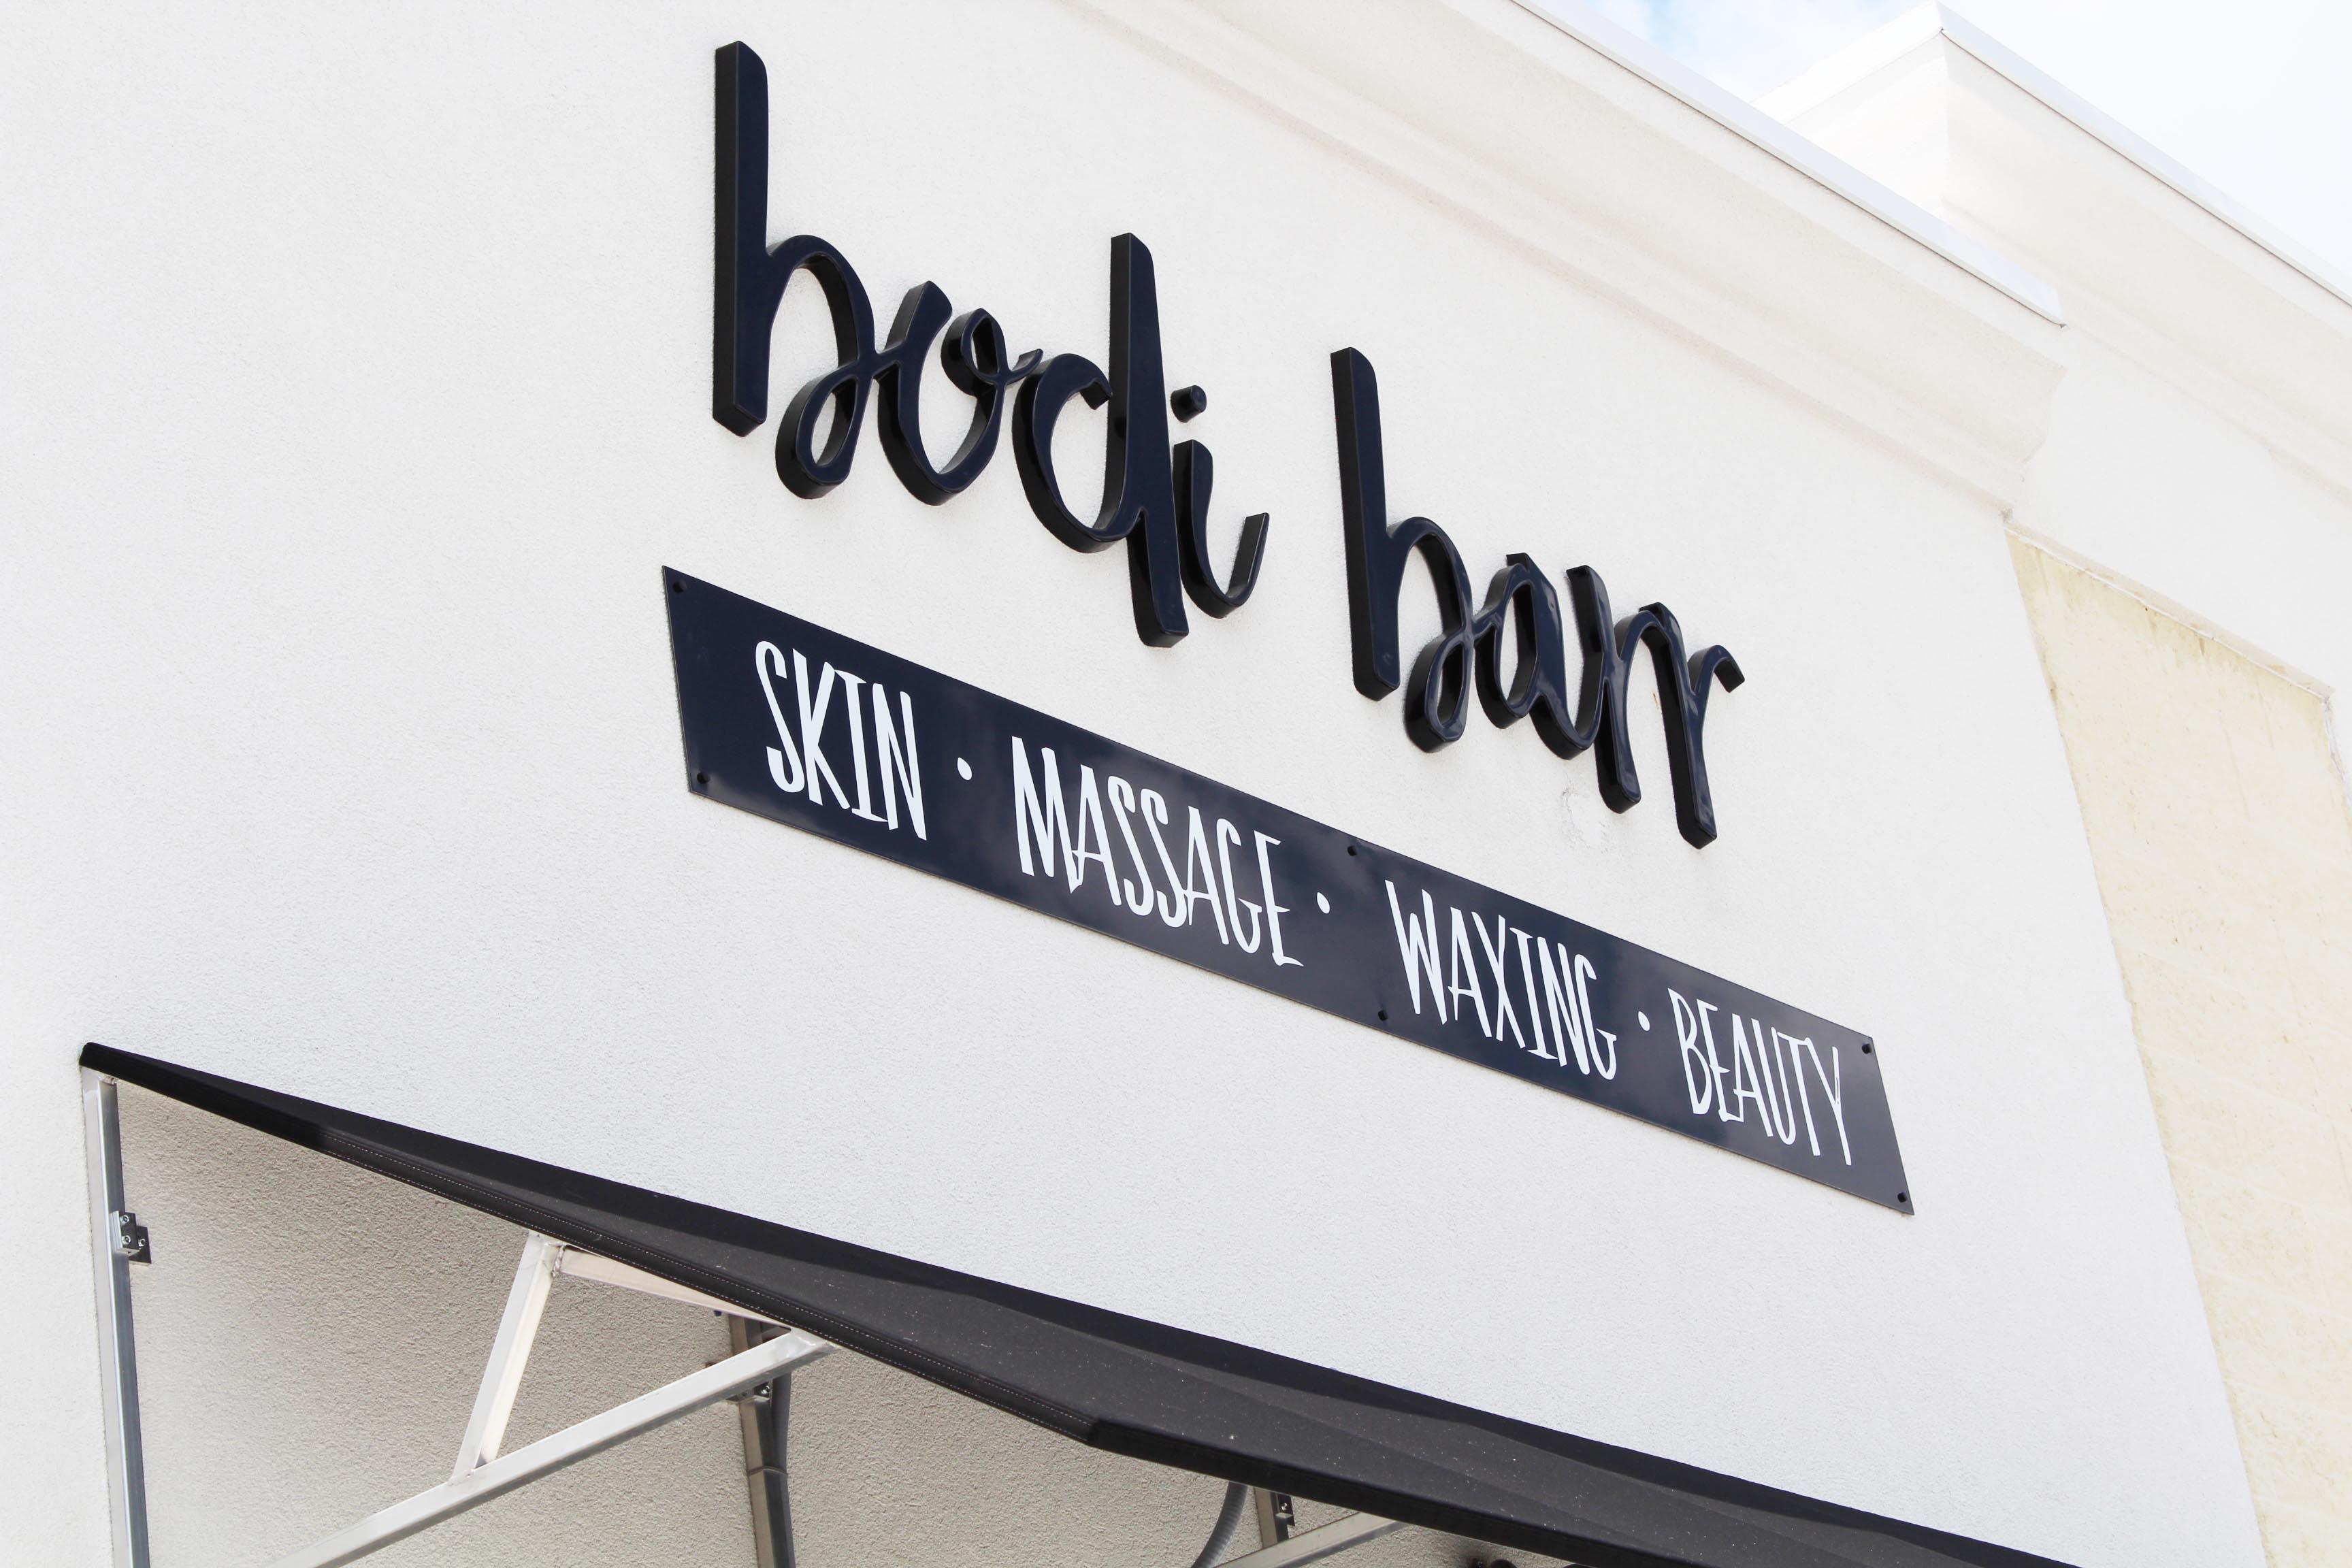 BodiBarr of Jacksonville, NC | Skin | Massage | Waxing | Beauty